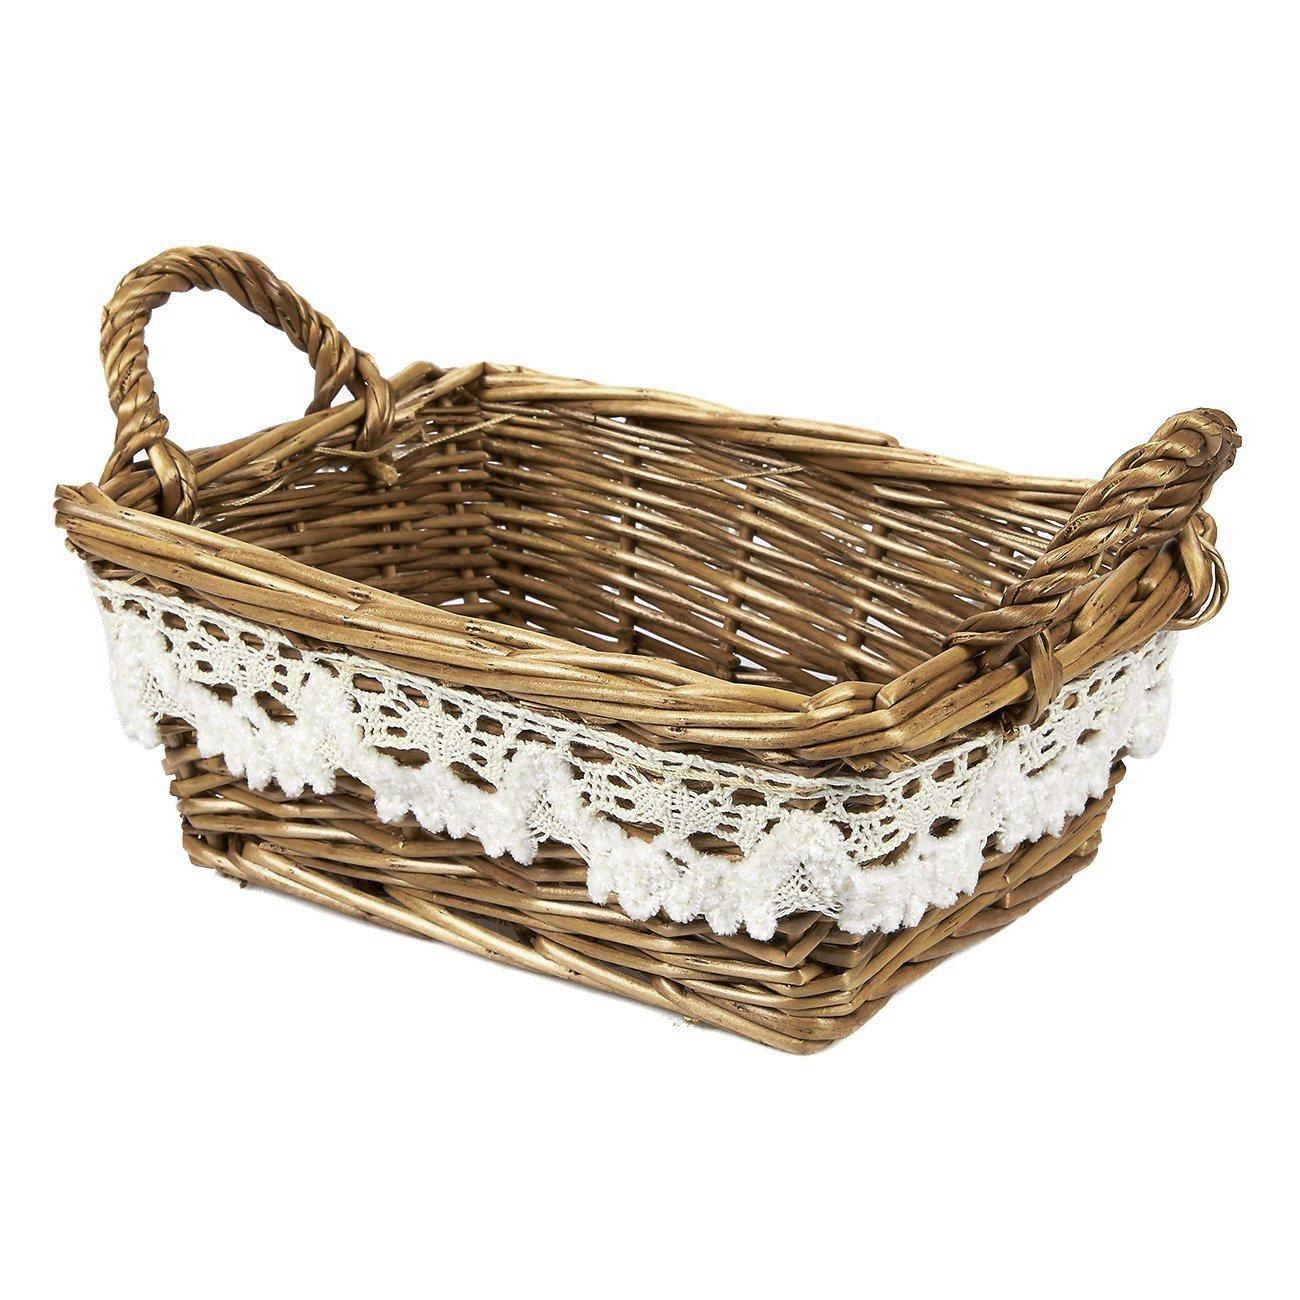 Amazon.com: Juvale Wicker Basket - Small Woven Fruit Basket, Storage Basket  Food, Picnics, Vintage Decoration, Brown - 8.5 x 5.5 x 3.5 inches: Home &  ...